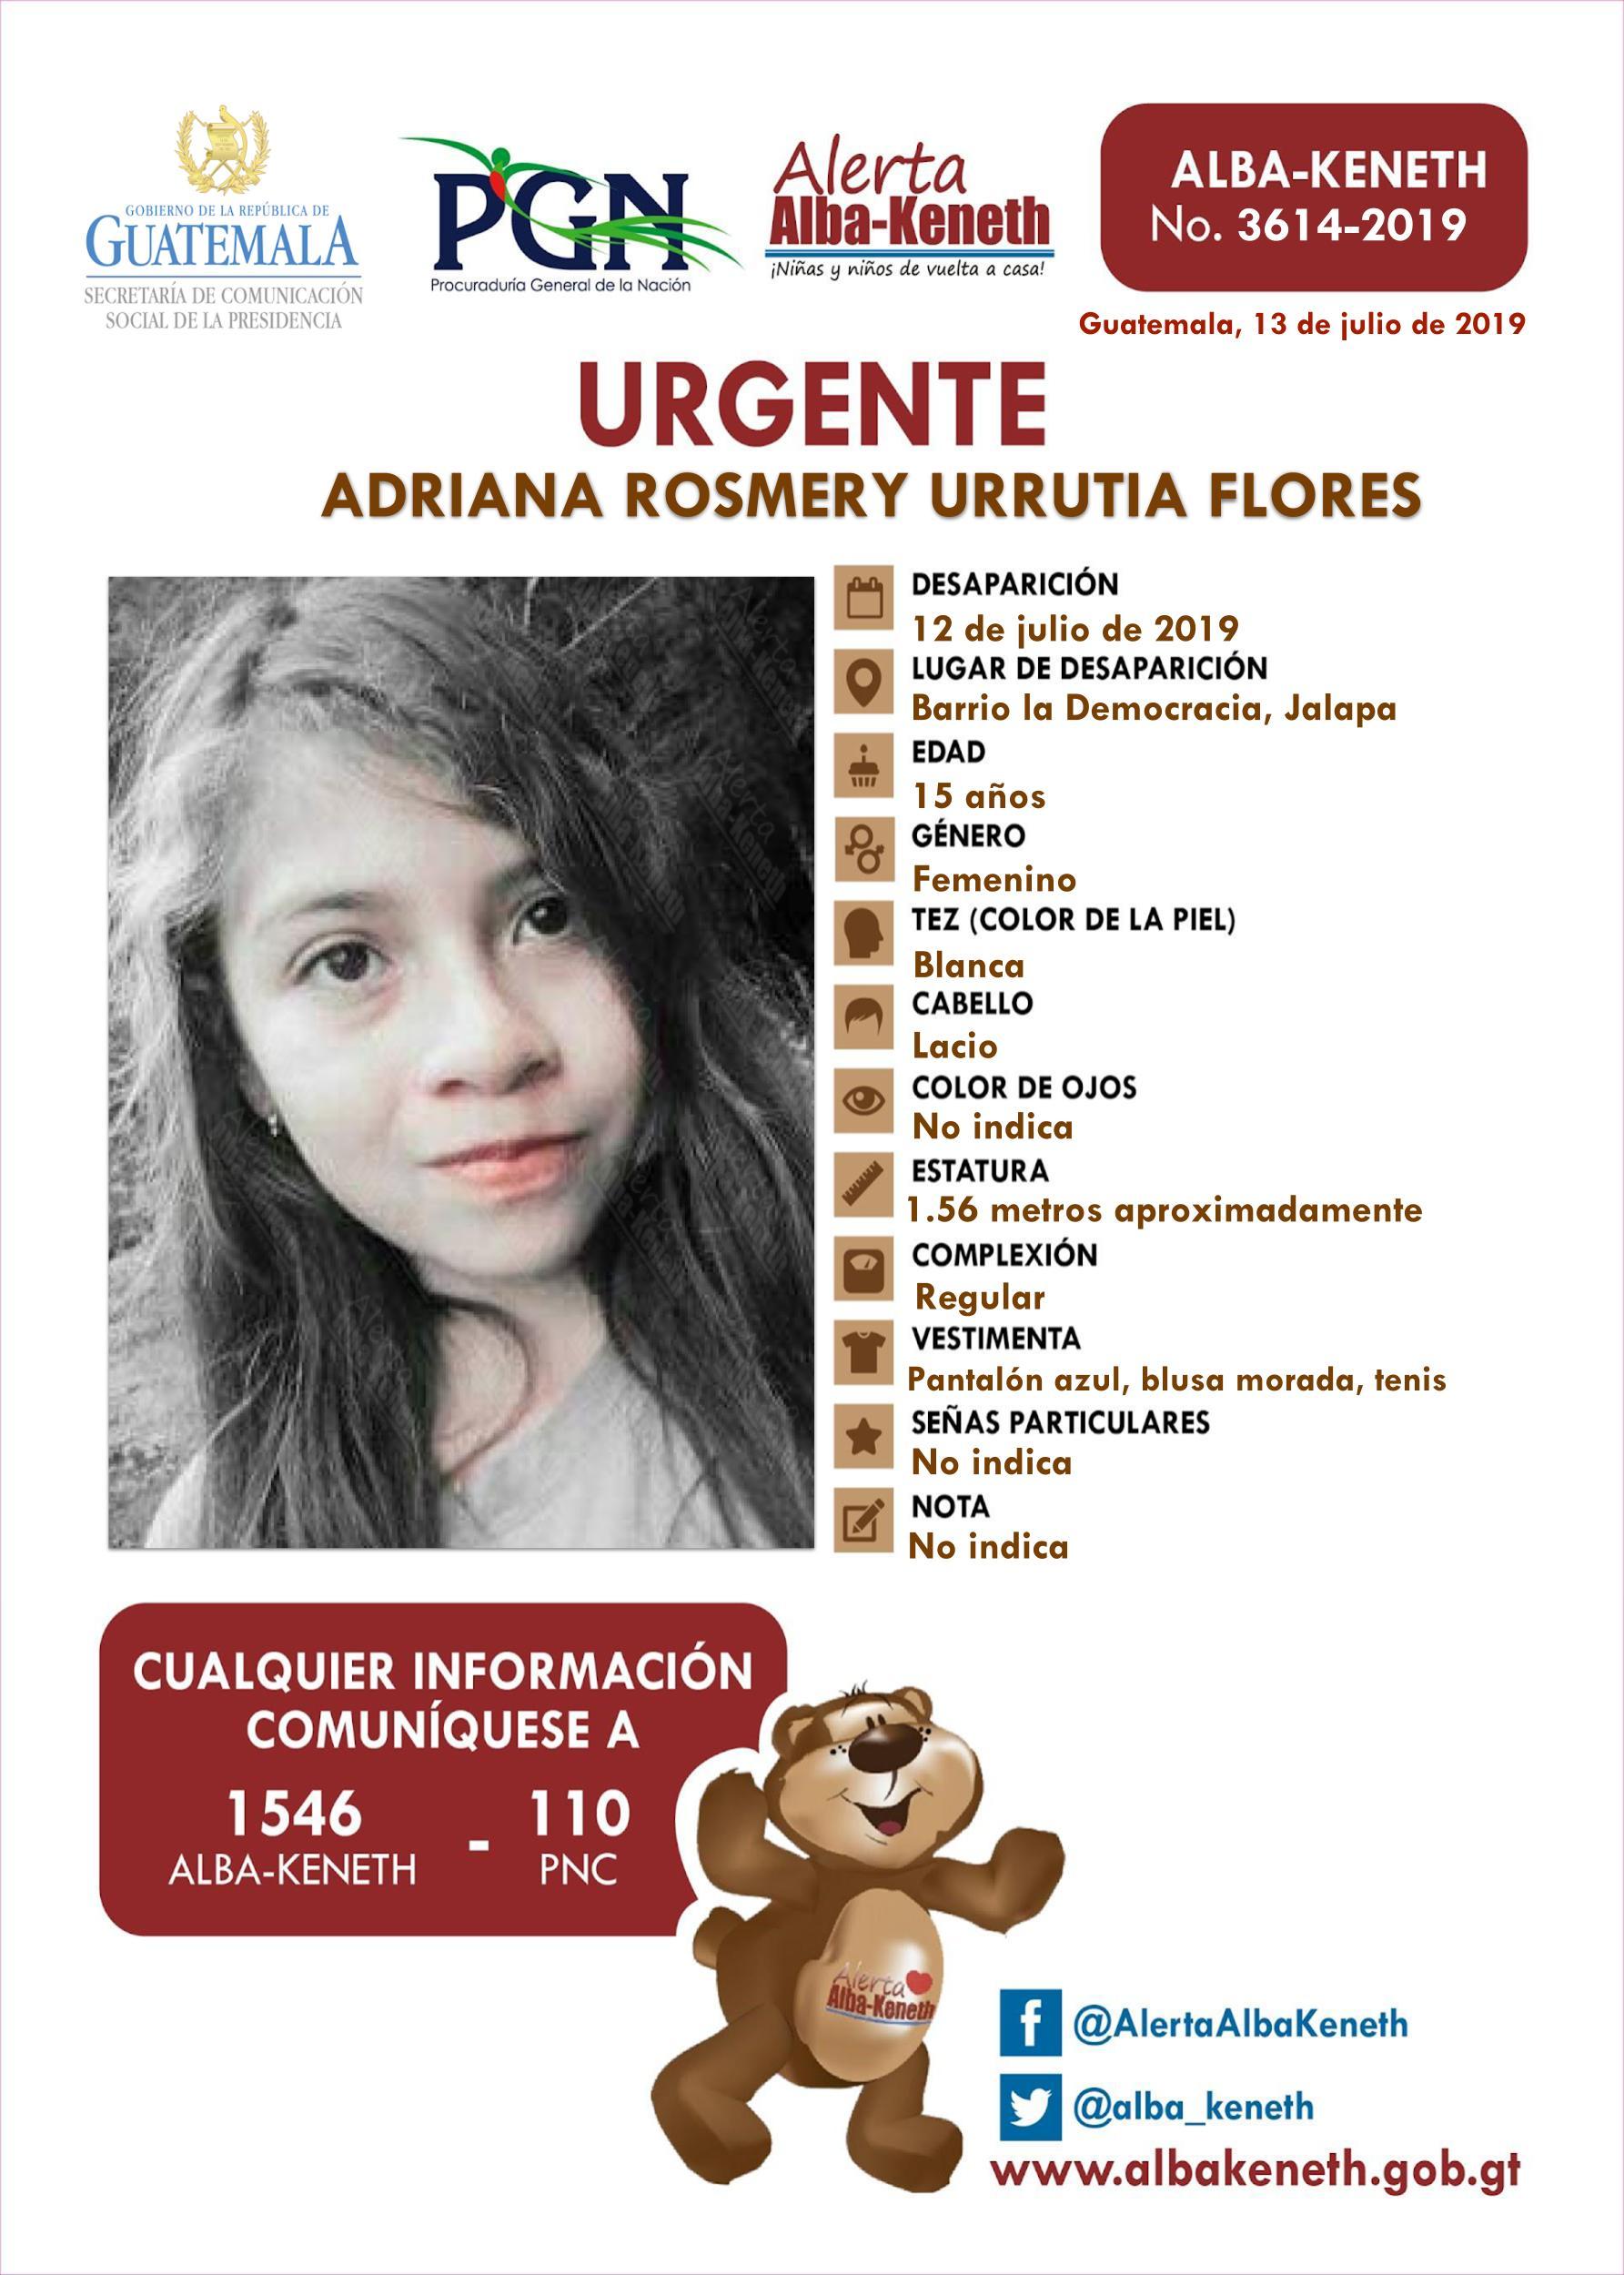 Adriana Rosmery Urrutia Flores